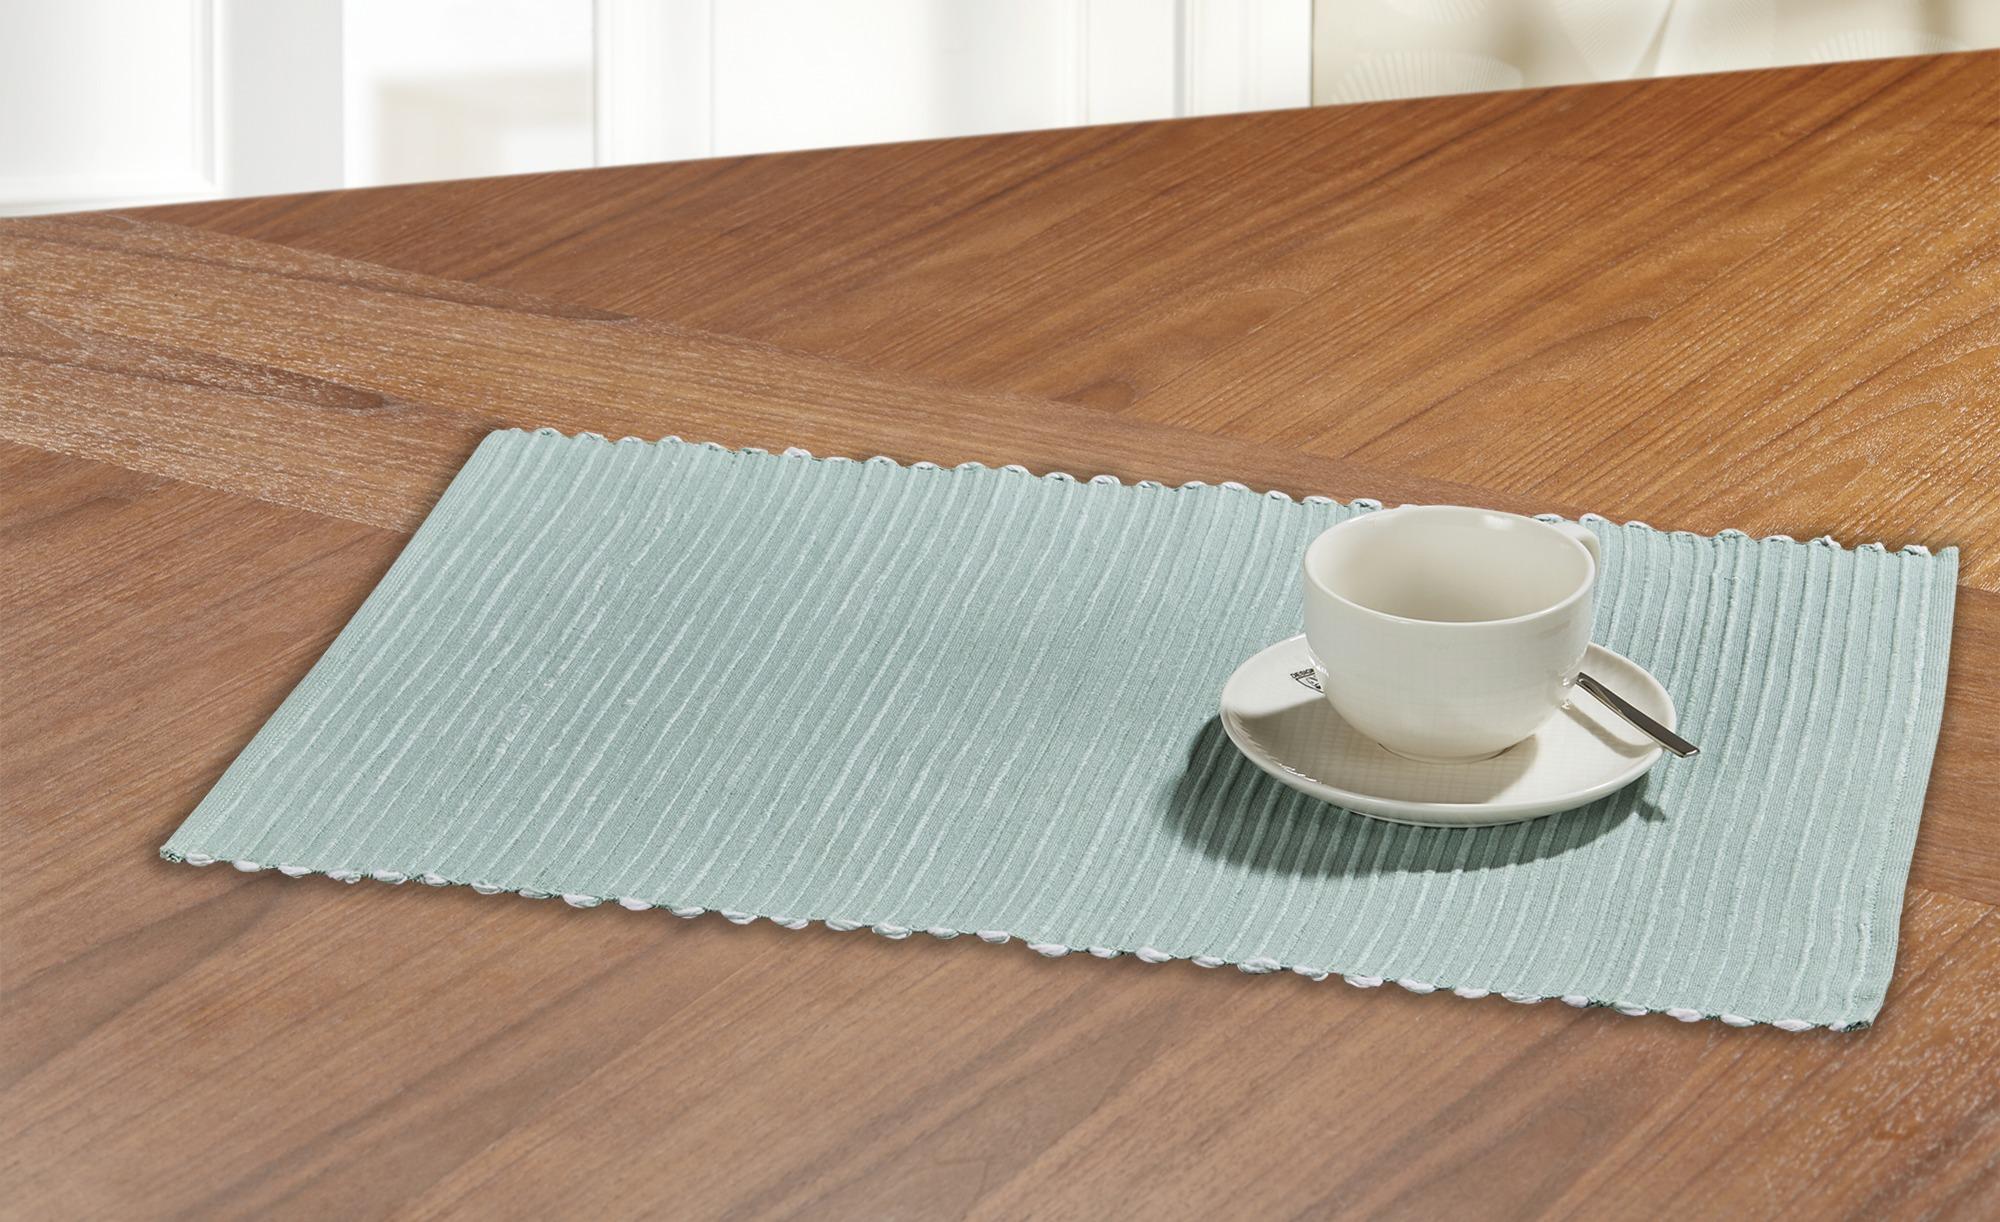 LAVIDA Platzset  Greta - türkis/petrol - Baumwolle - 33 cm - Heimtextilien > Tischwäsche > Platzsets - Möbel Kraft | Heimtextilien > Tischdecken und Co > Platz-Sets | LAVIDA